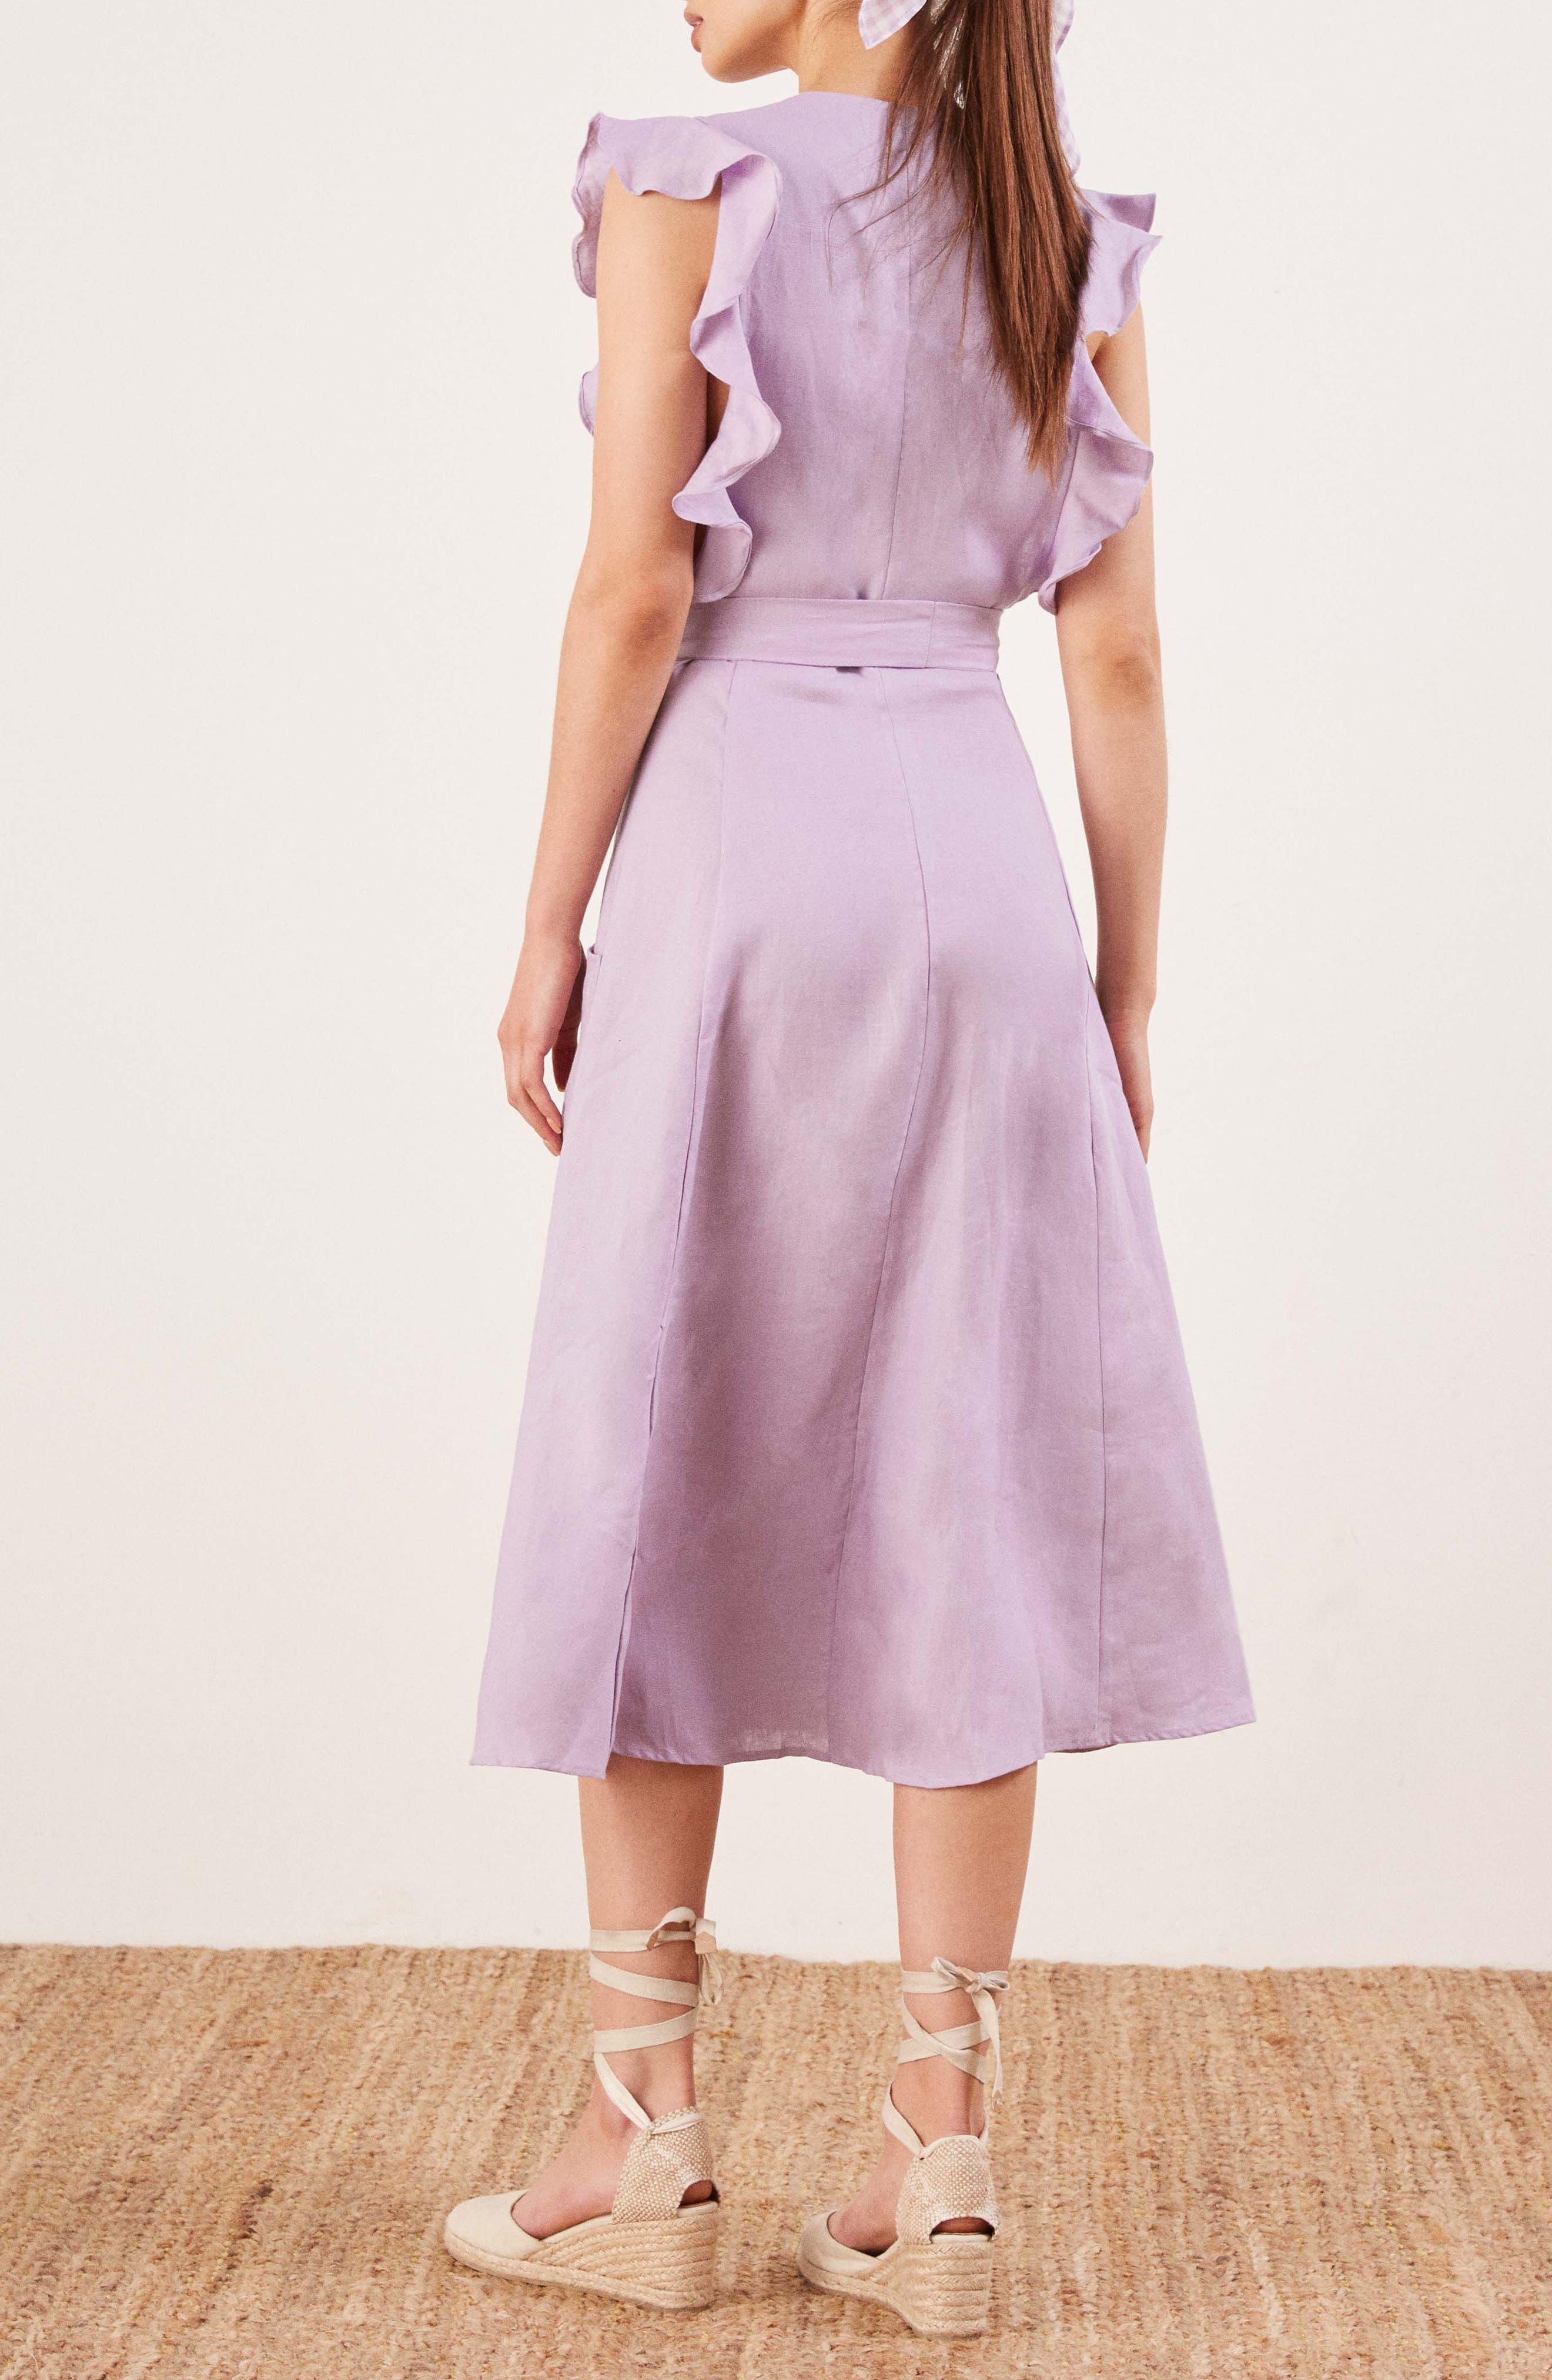 Serengeti Linen Dress,                             Alternate thumbnail 3, color,                             500